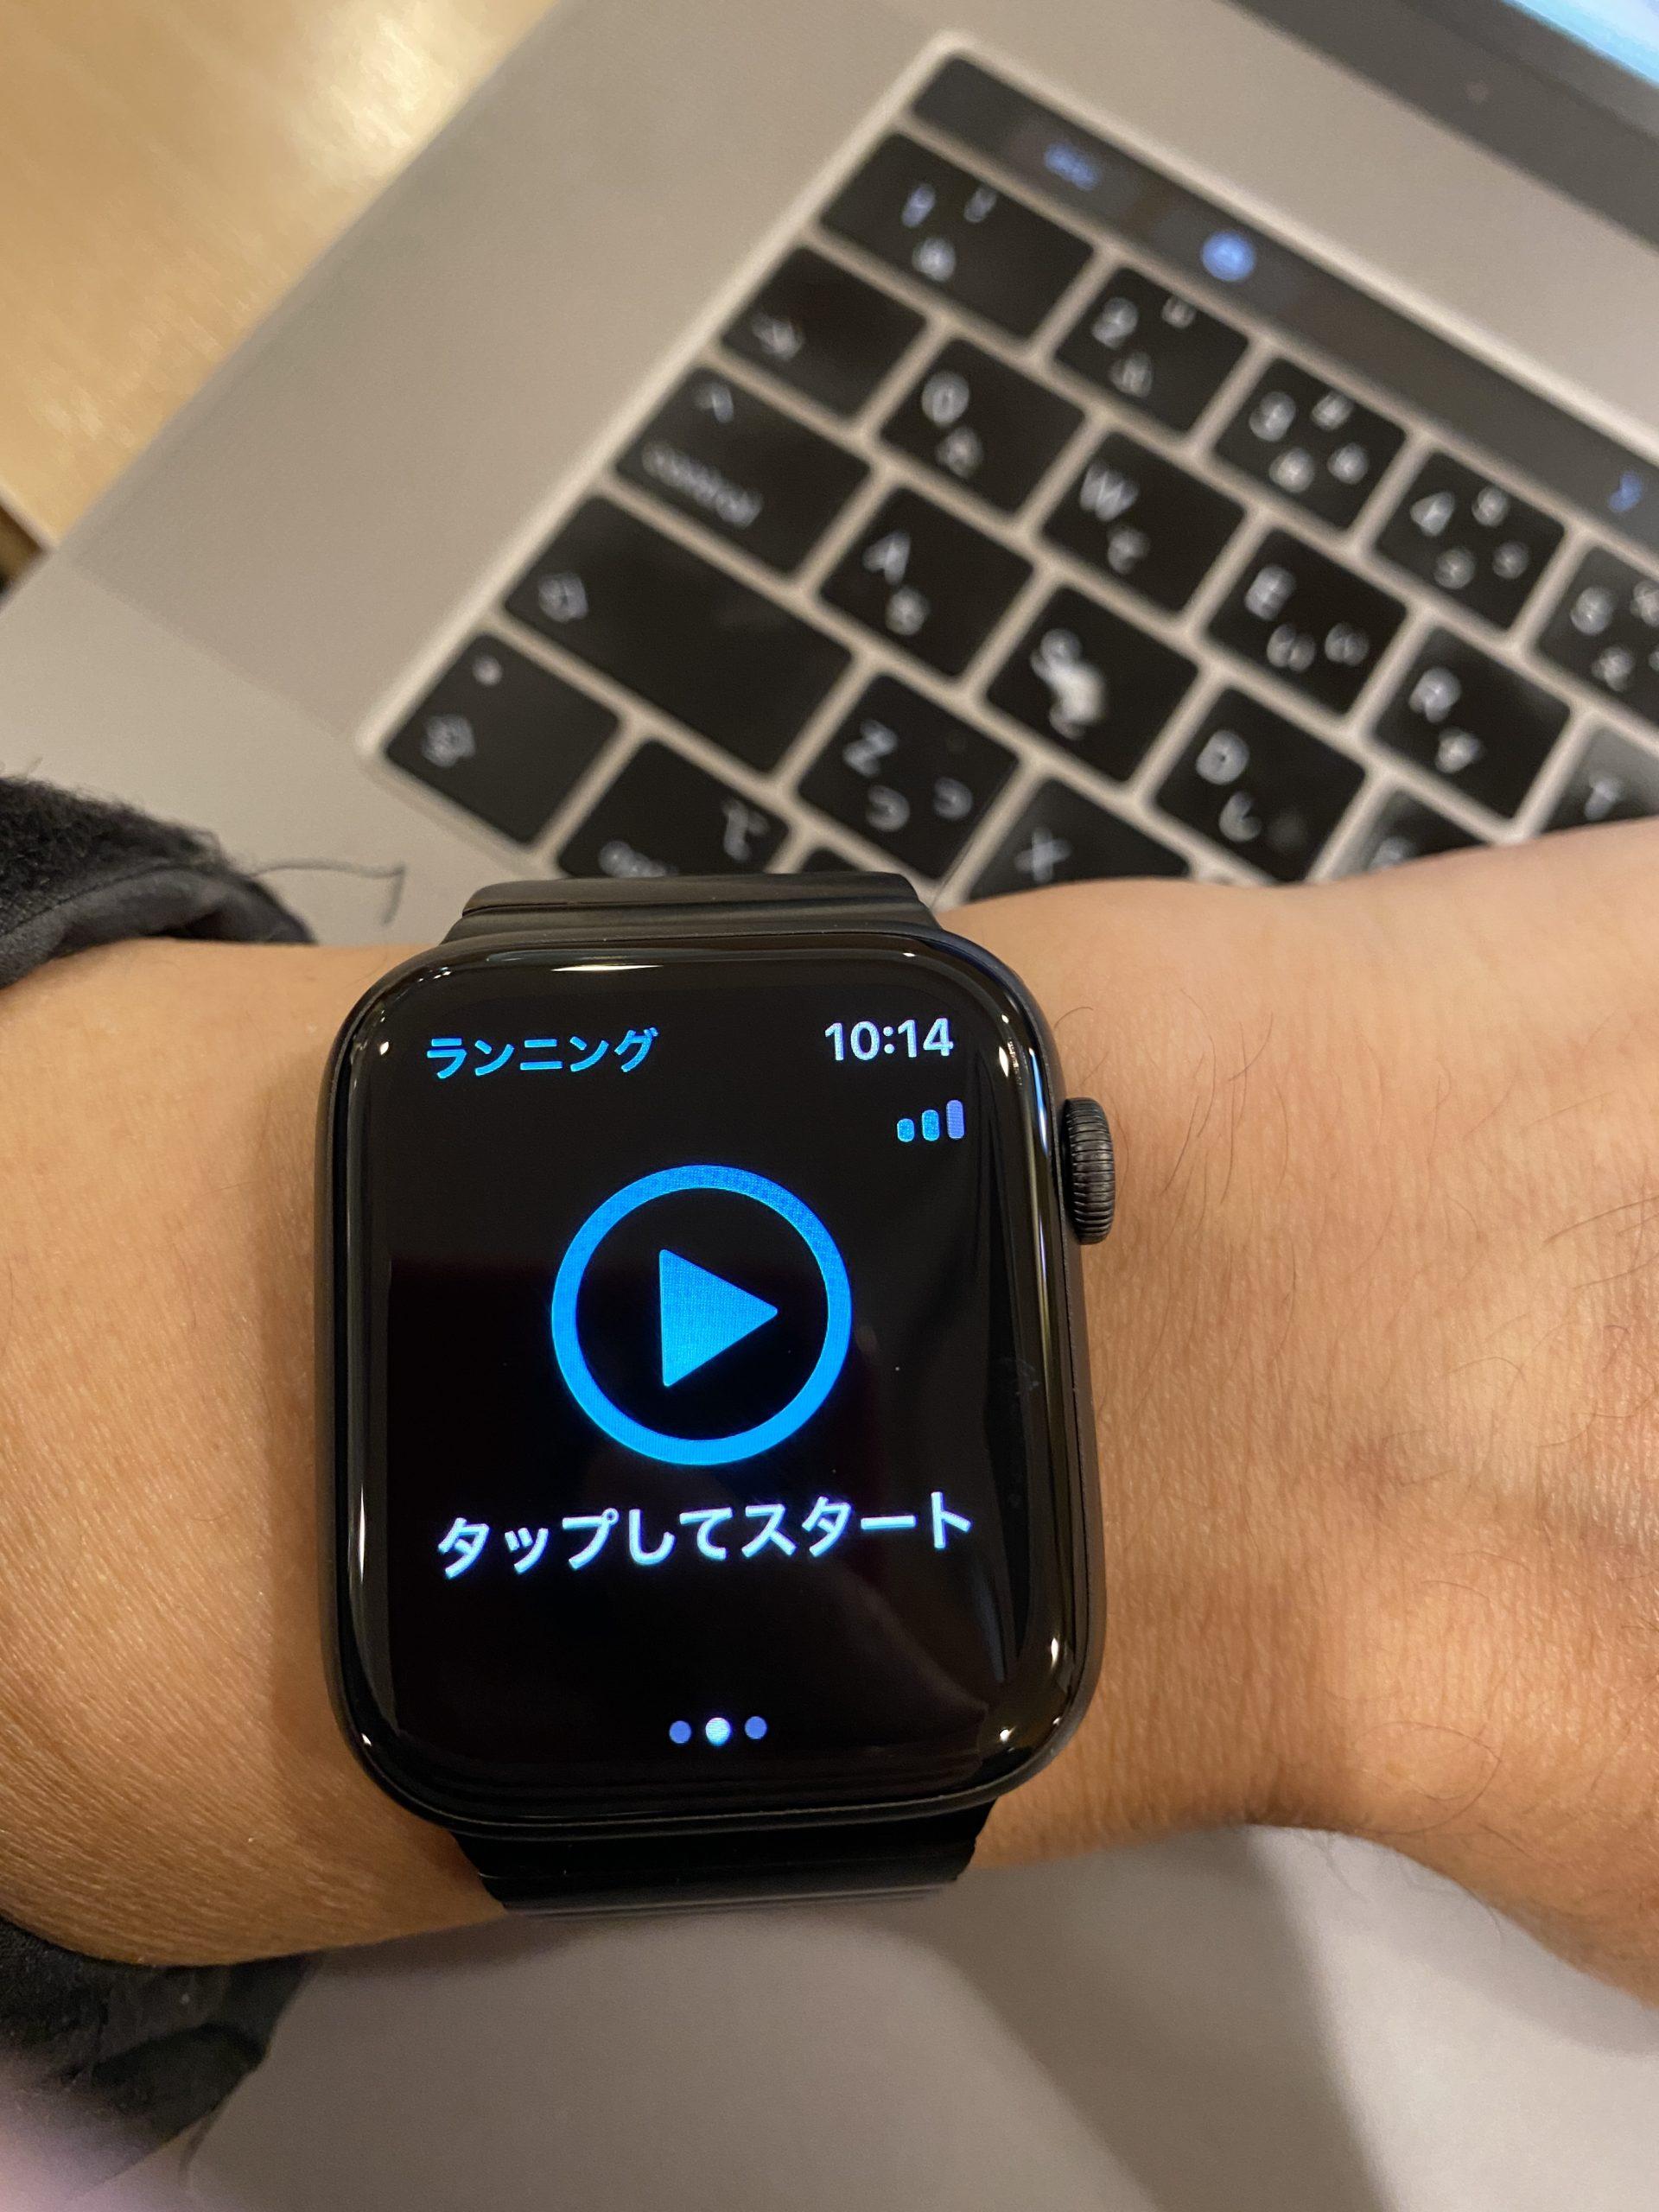 Apple Watchでも可能。「Runkeeper」(ランキーパー)ランニングアプリを3週間使ってみた感想